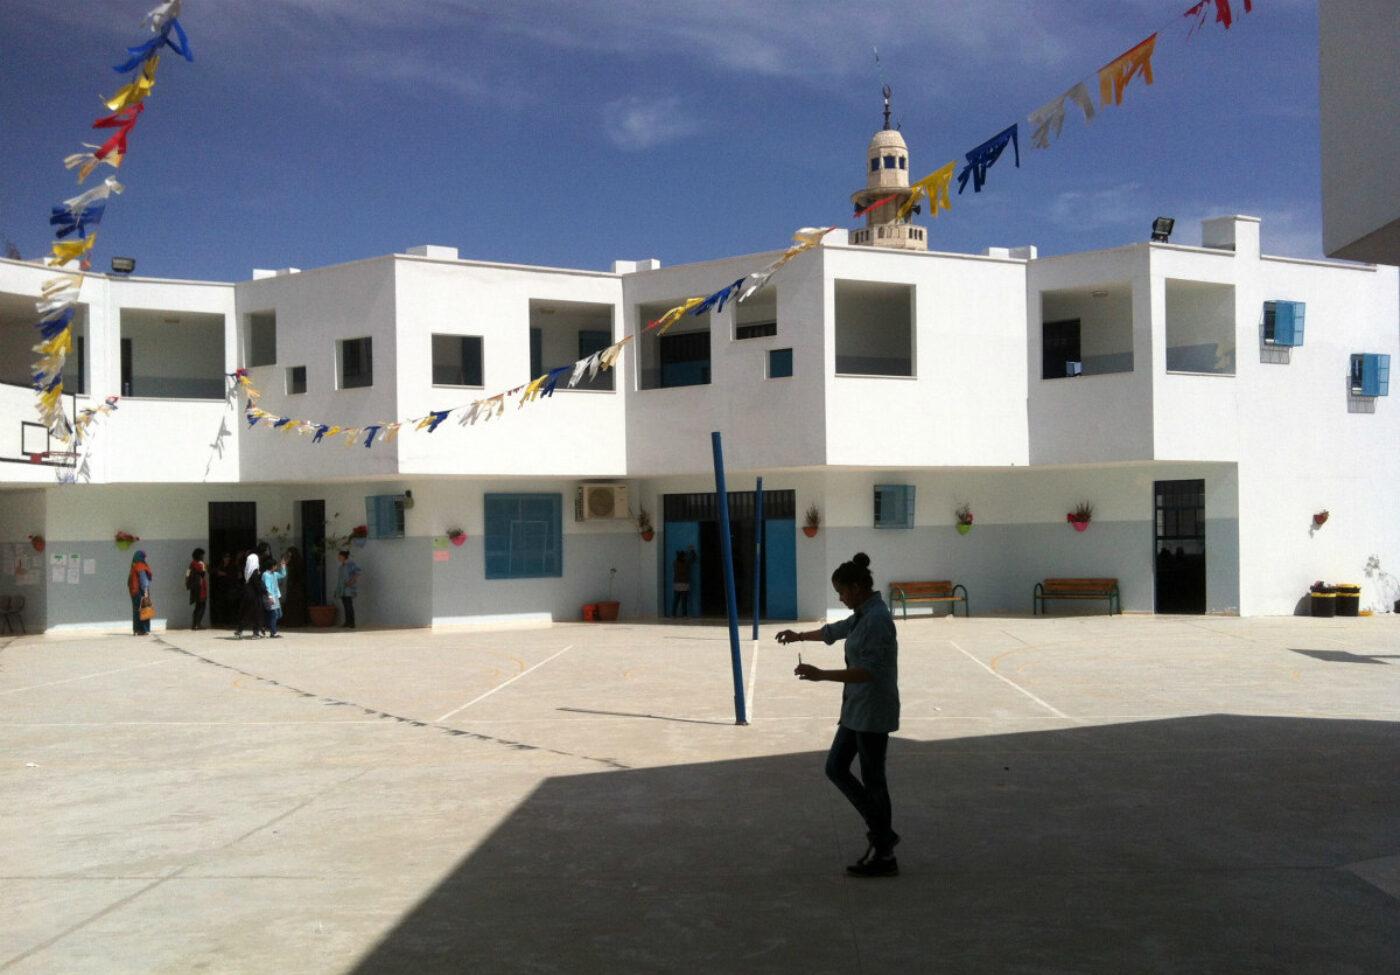 School in Exile